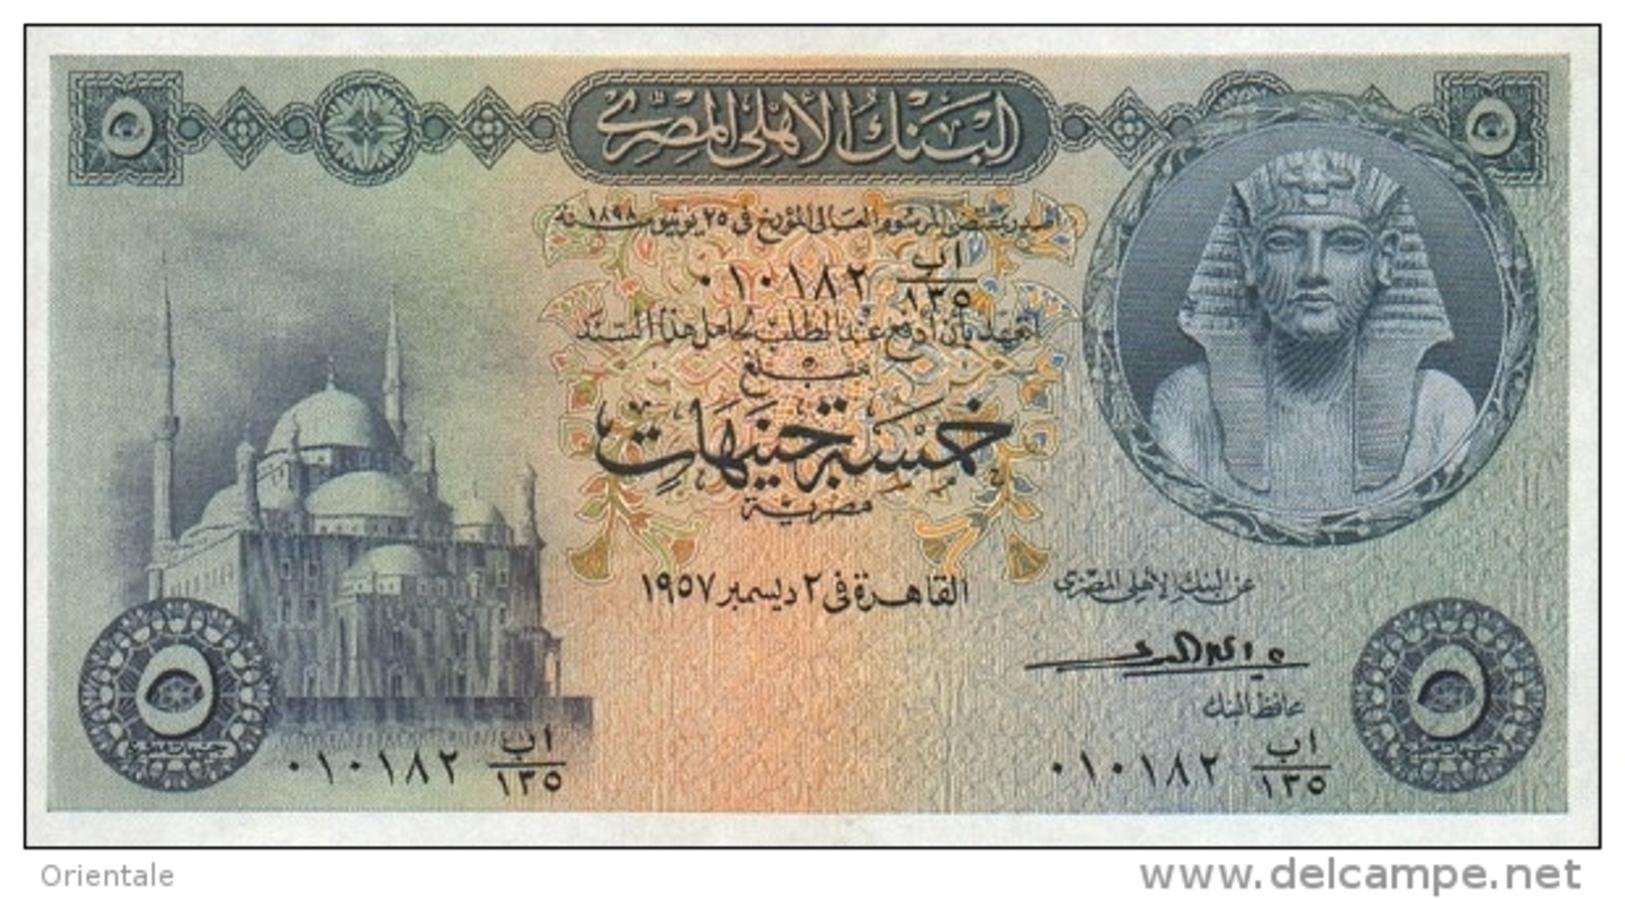 EGYPT  P. 31 5 P 1957 UNC - Egypt